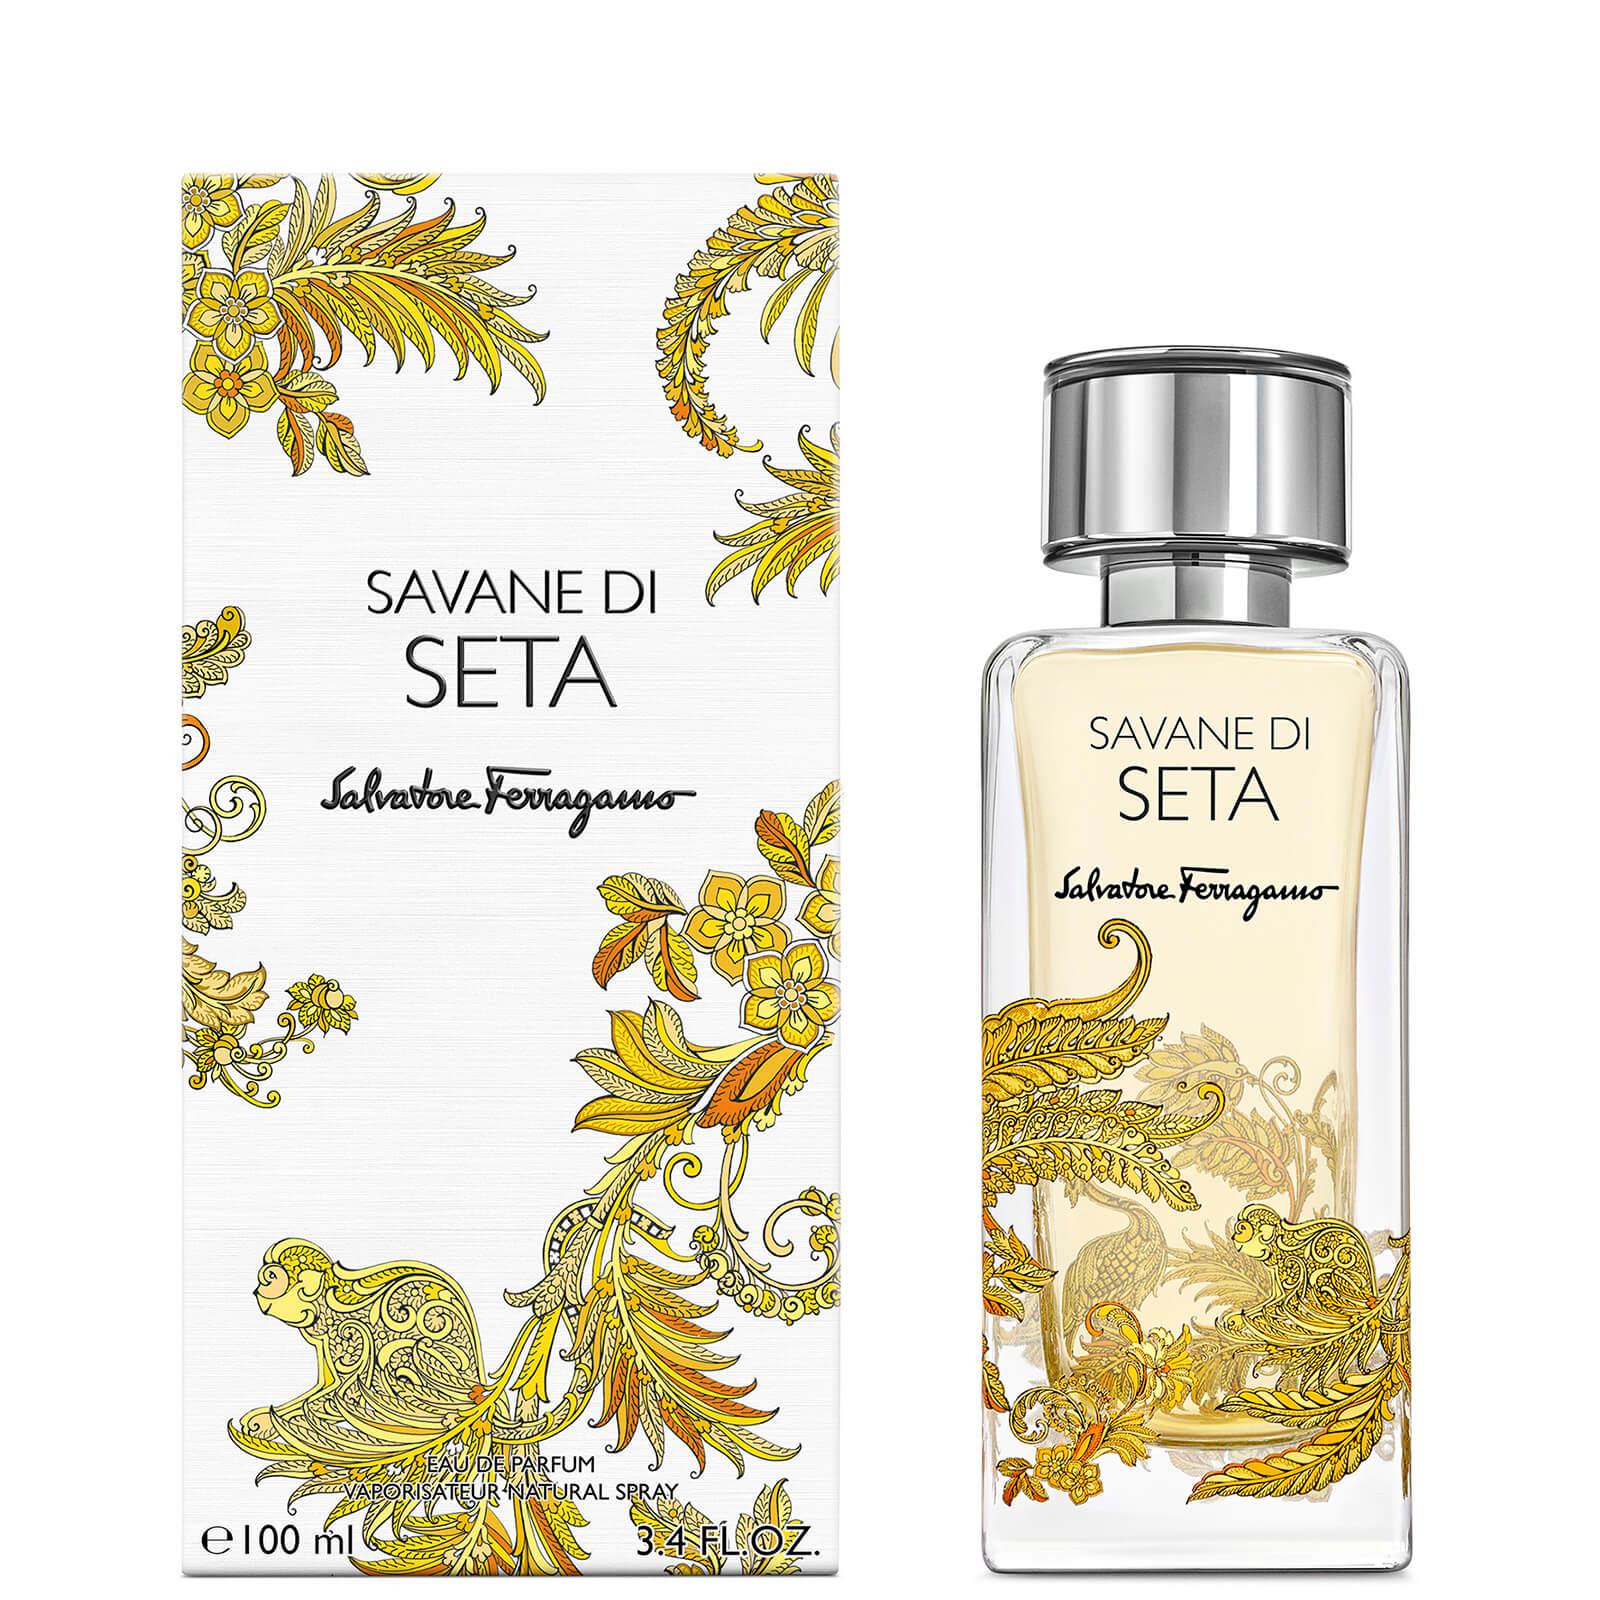 Image of Eau de Parfum Storie Savane Di Seta Salvatore Ferragamo 100ml